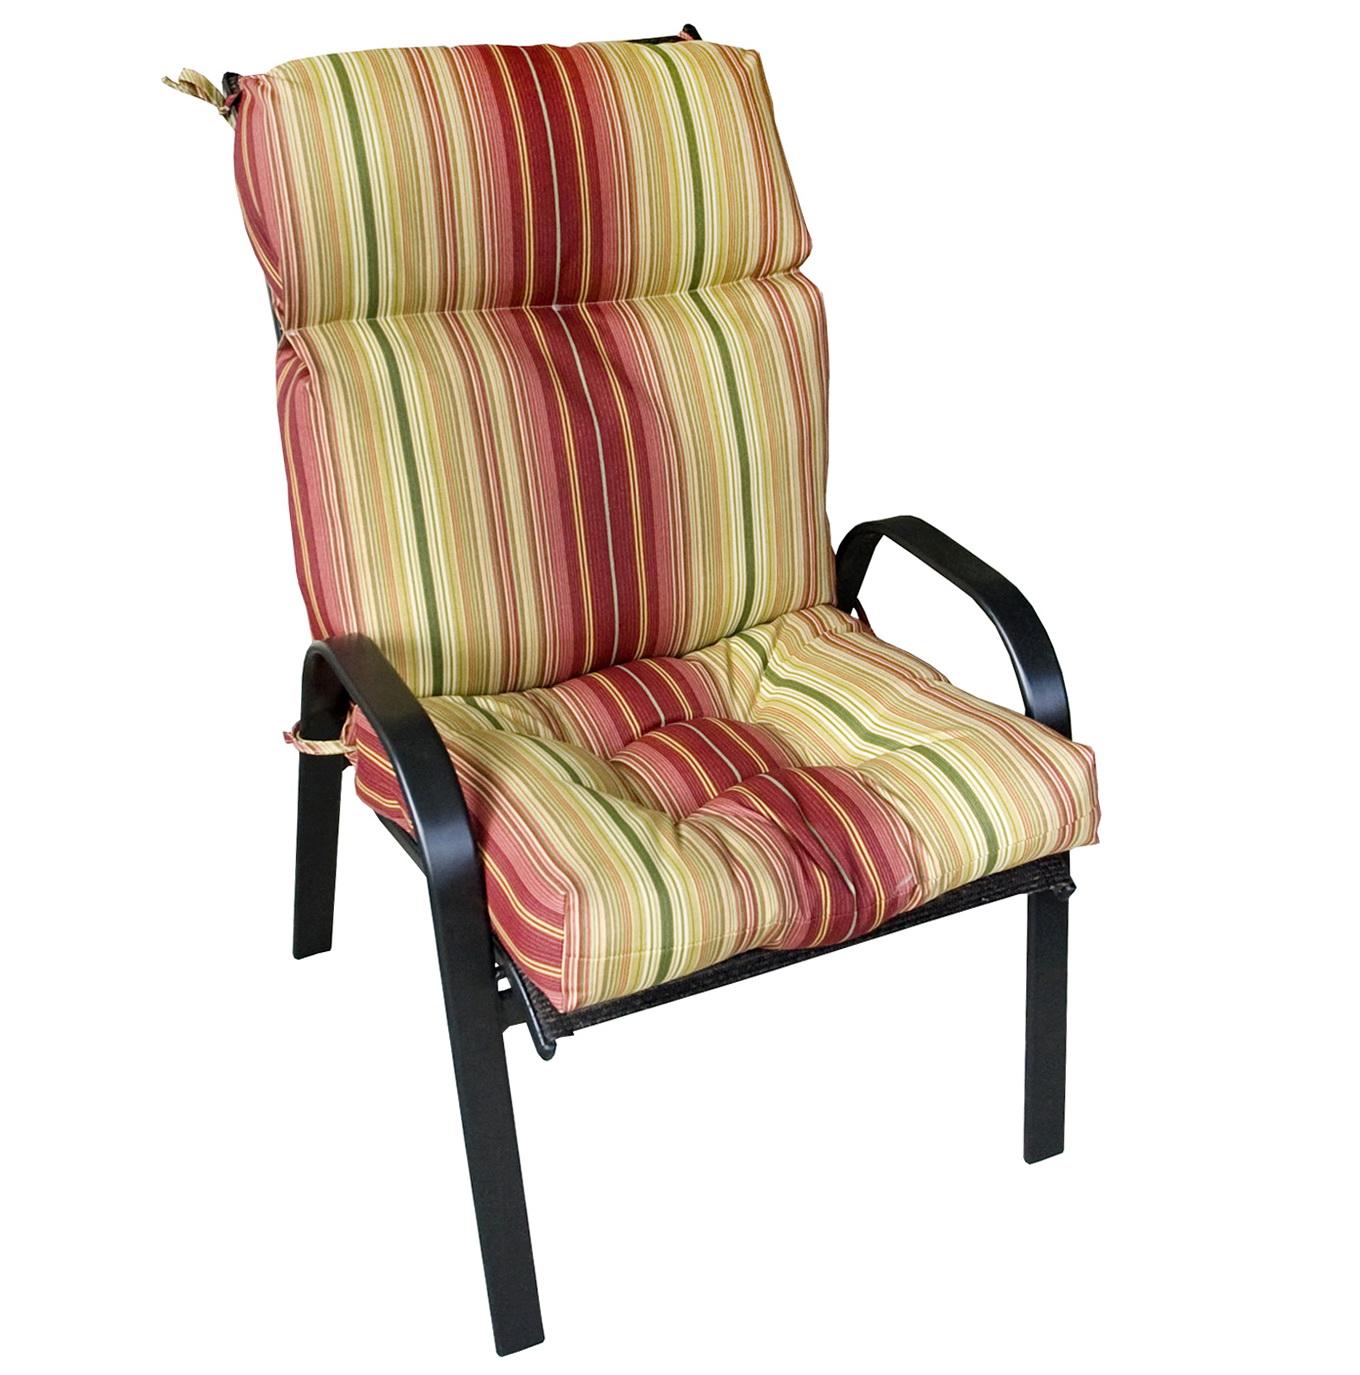 Patio Furniture Seat Cushions Sale